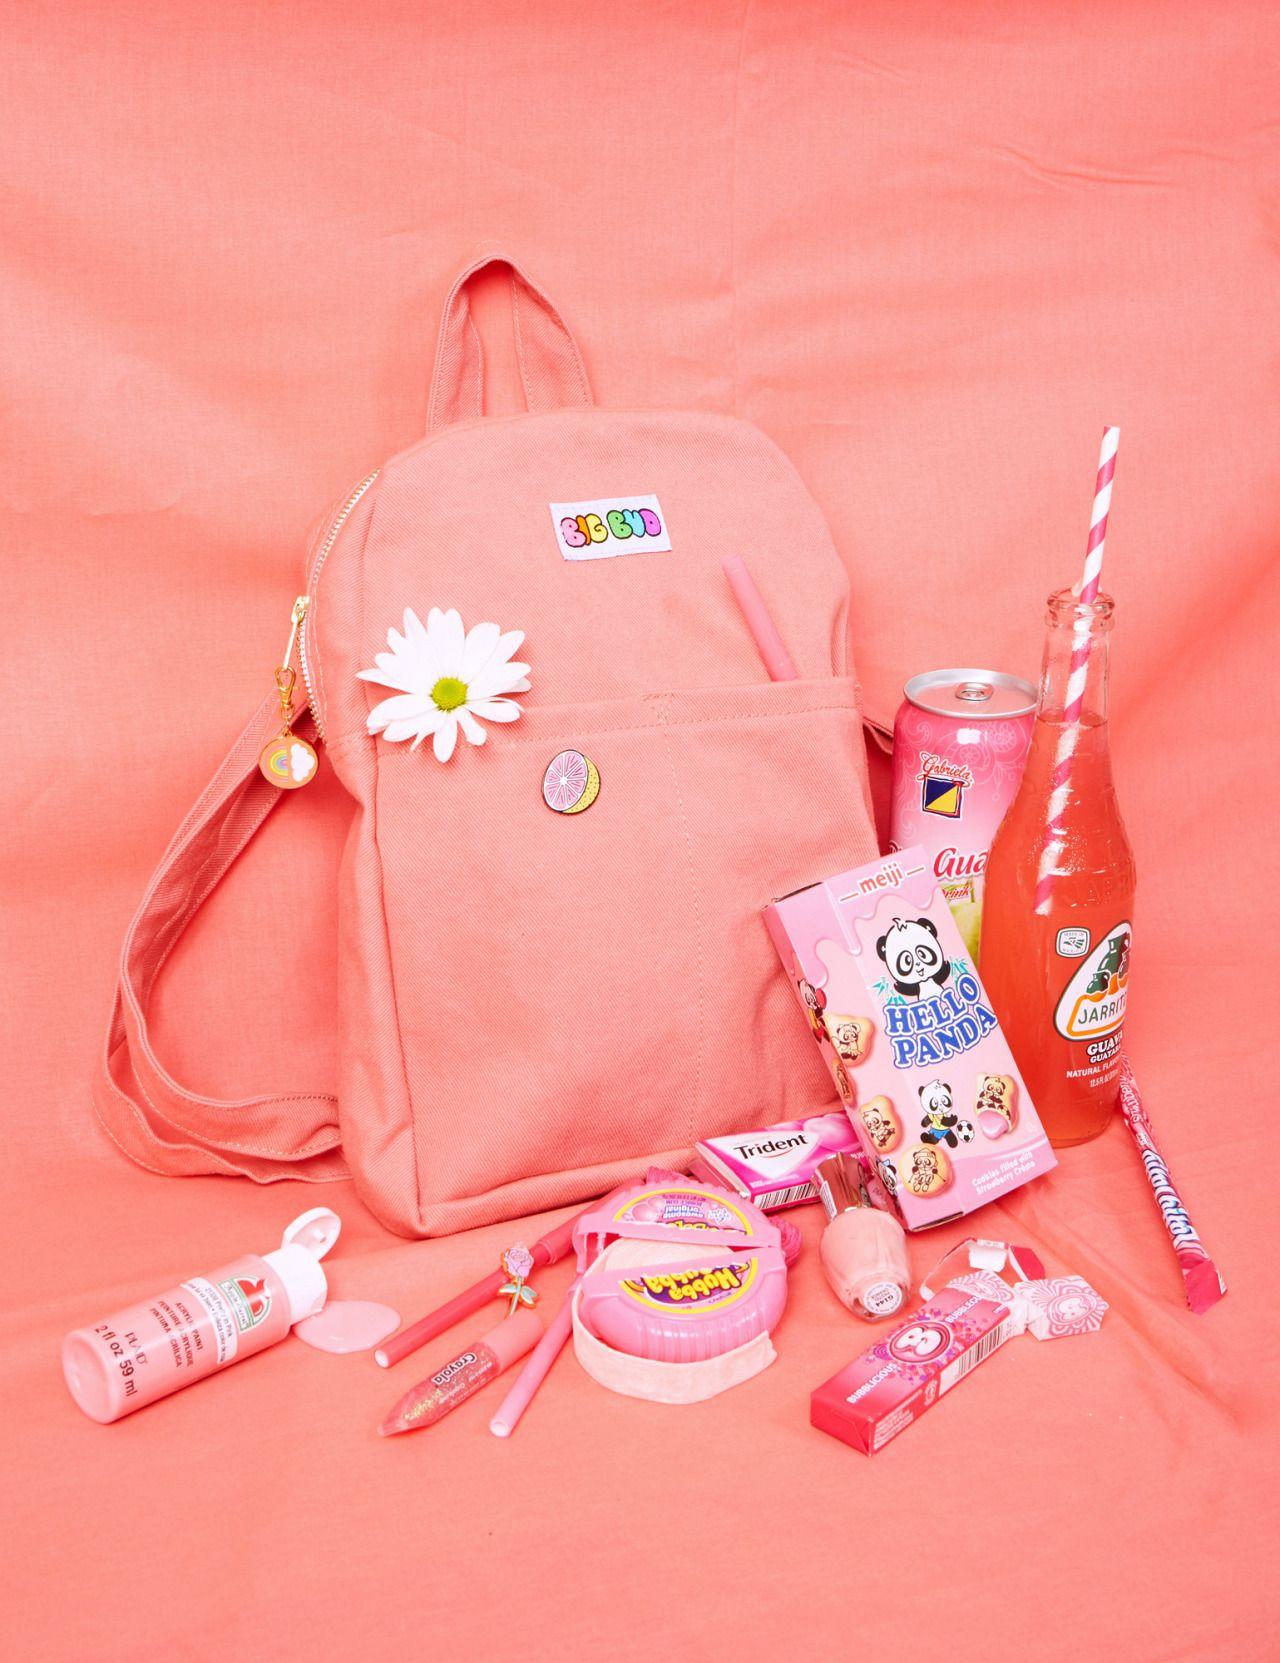 Pinterest Bellaxlovee ☾ Cute Pink Pink Aesthetic